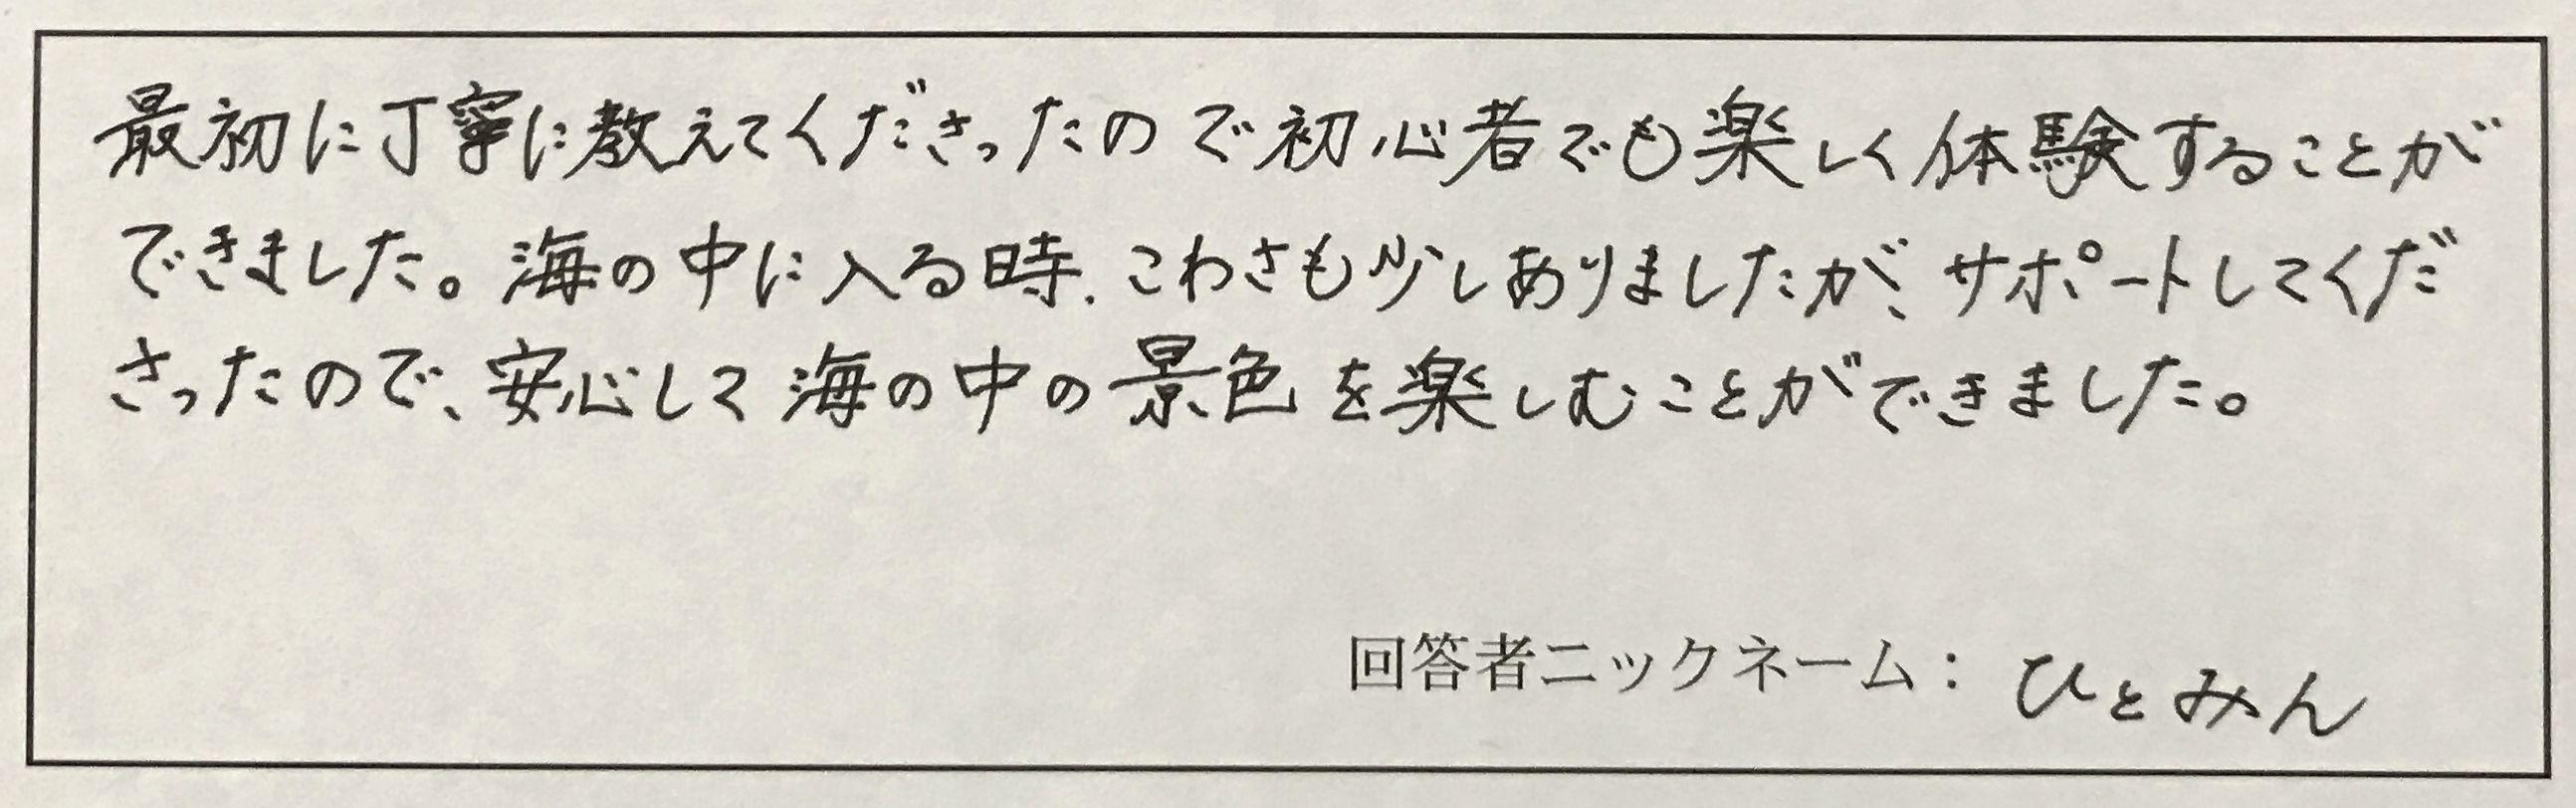 IMG_27381.jpg